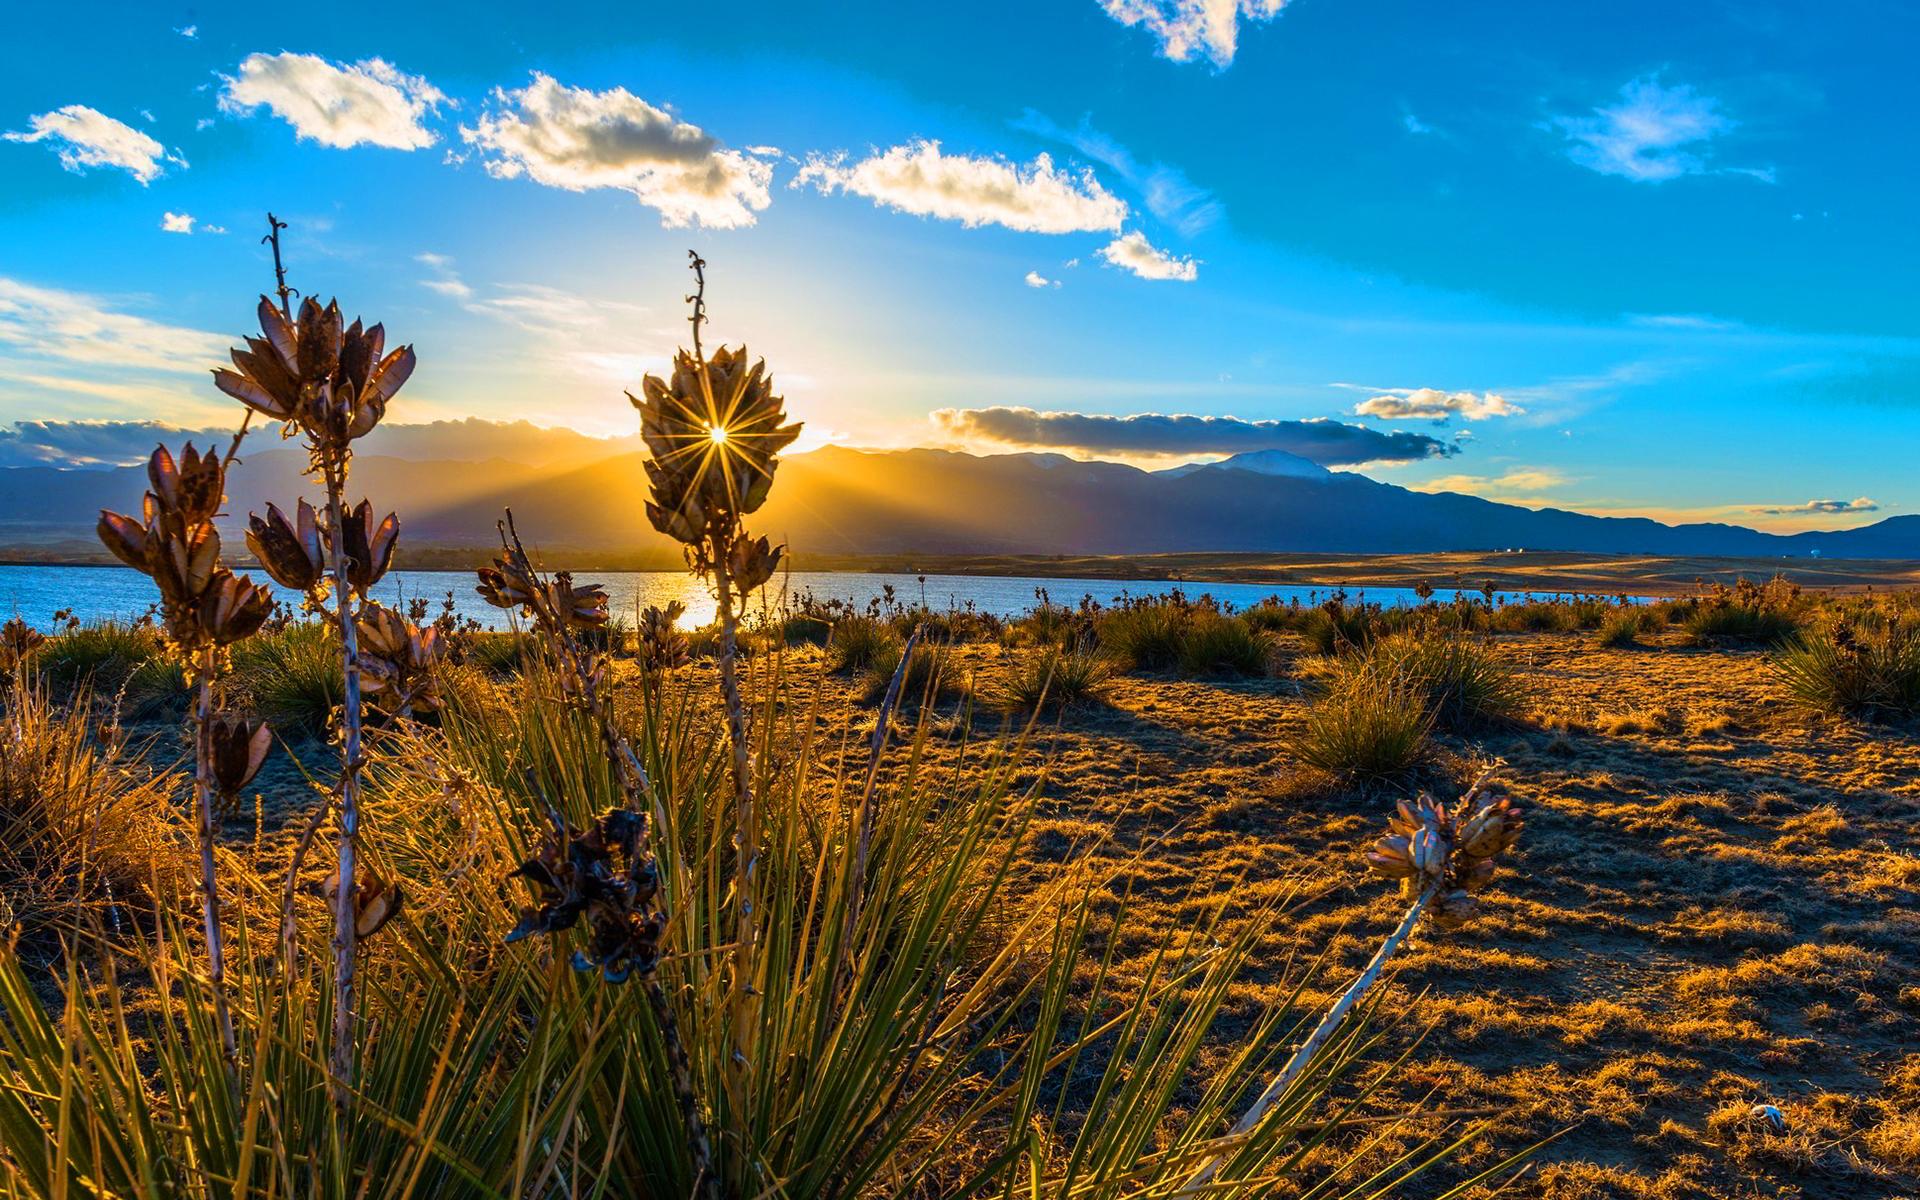 Sunset bluestem praire colorado springs